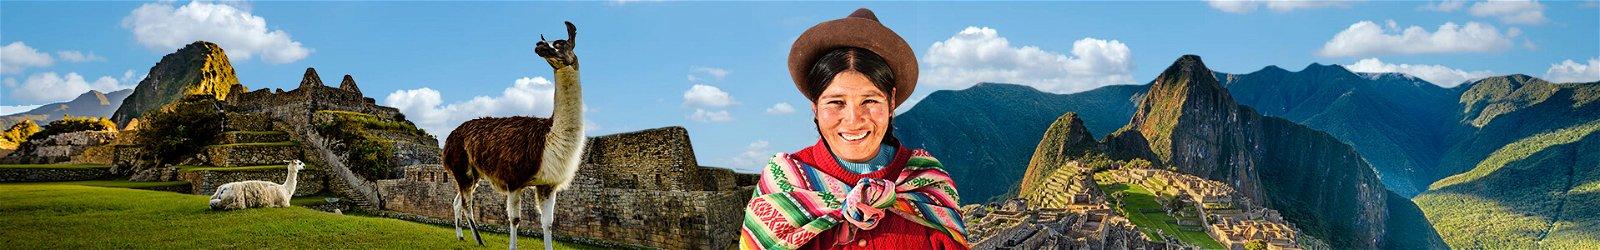 Viaje a Machu Picchu desde México 2020